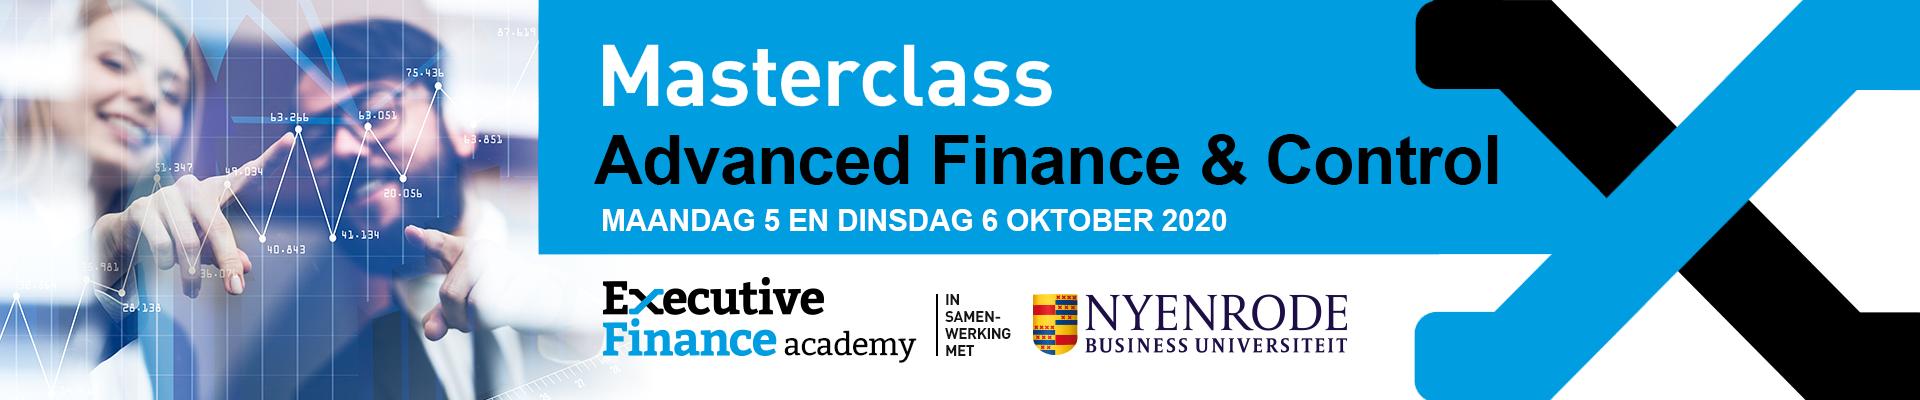 Masterclass Advanced Finance & Control najaar 2020